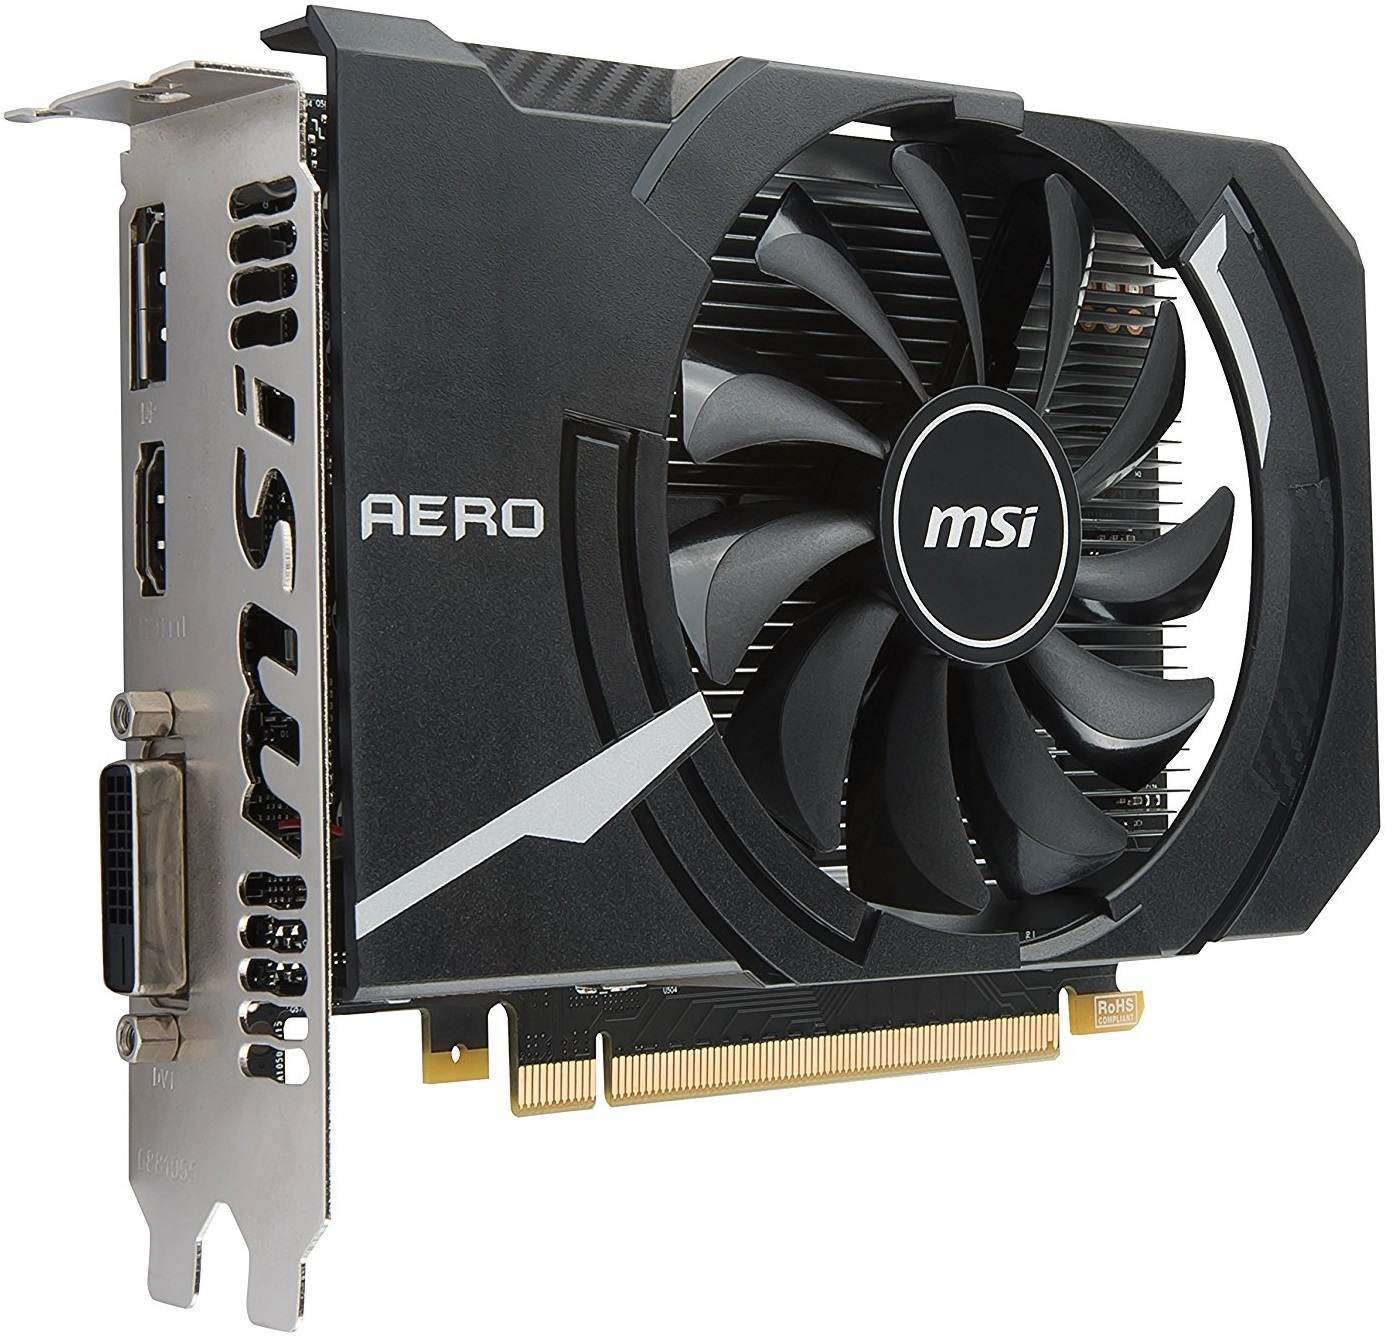 MSI GeForce GTX 1050 TI Aero 4GB OC V1 Graphics Card image